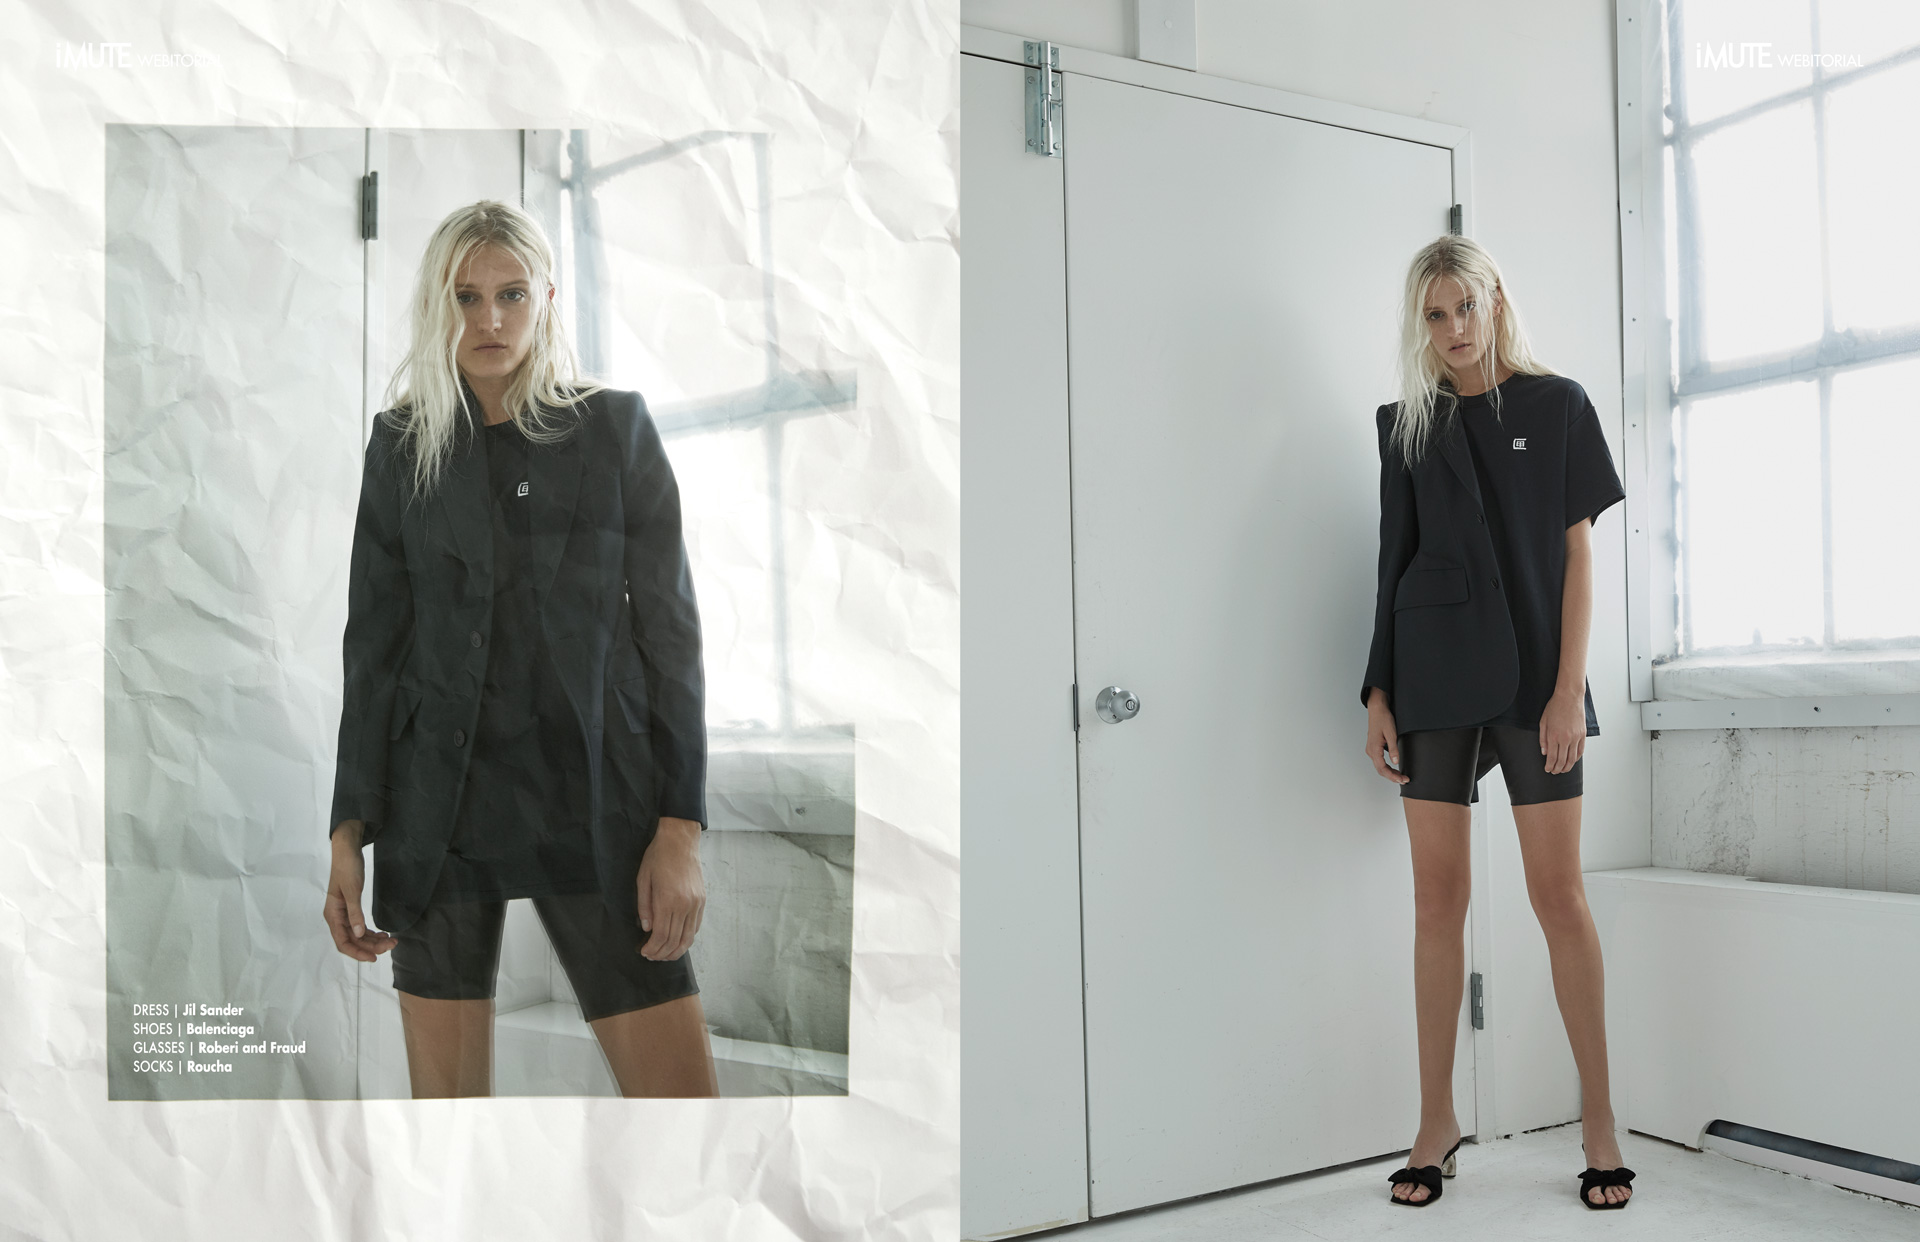 Black is the new Black webitorial for iMute Magazine Photographer|Kimber Capriotti Model| Abby Hendershot @Marilyn Agency NY Stylist|Gina Marie Barbaro Makeup|Heather Schnell Hair|Yukie Nammori